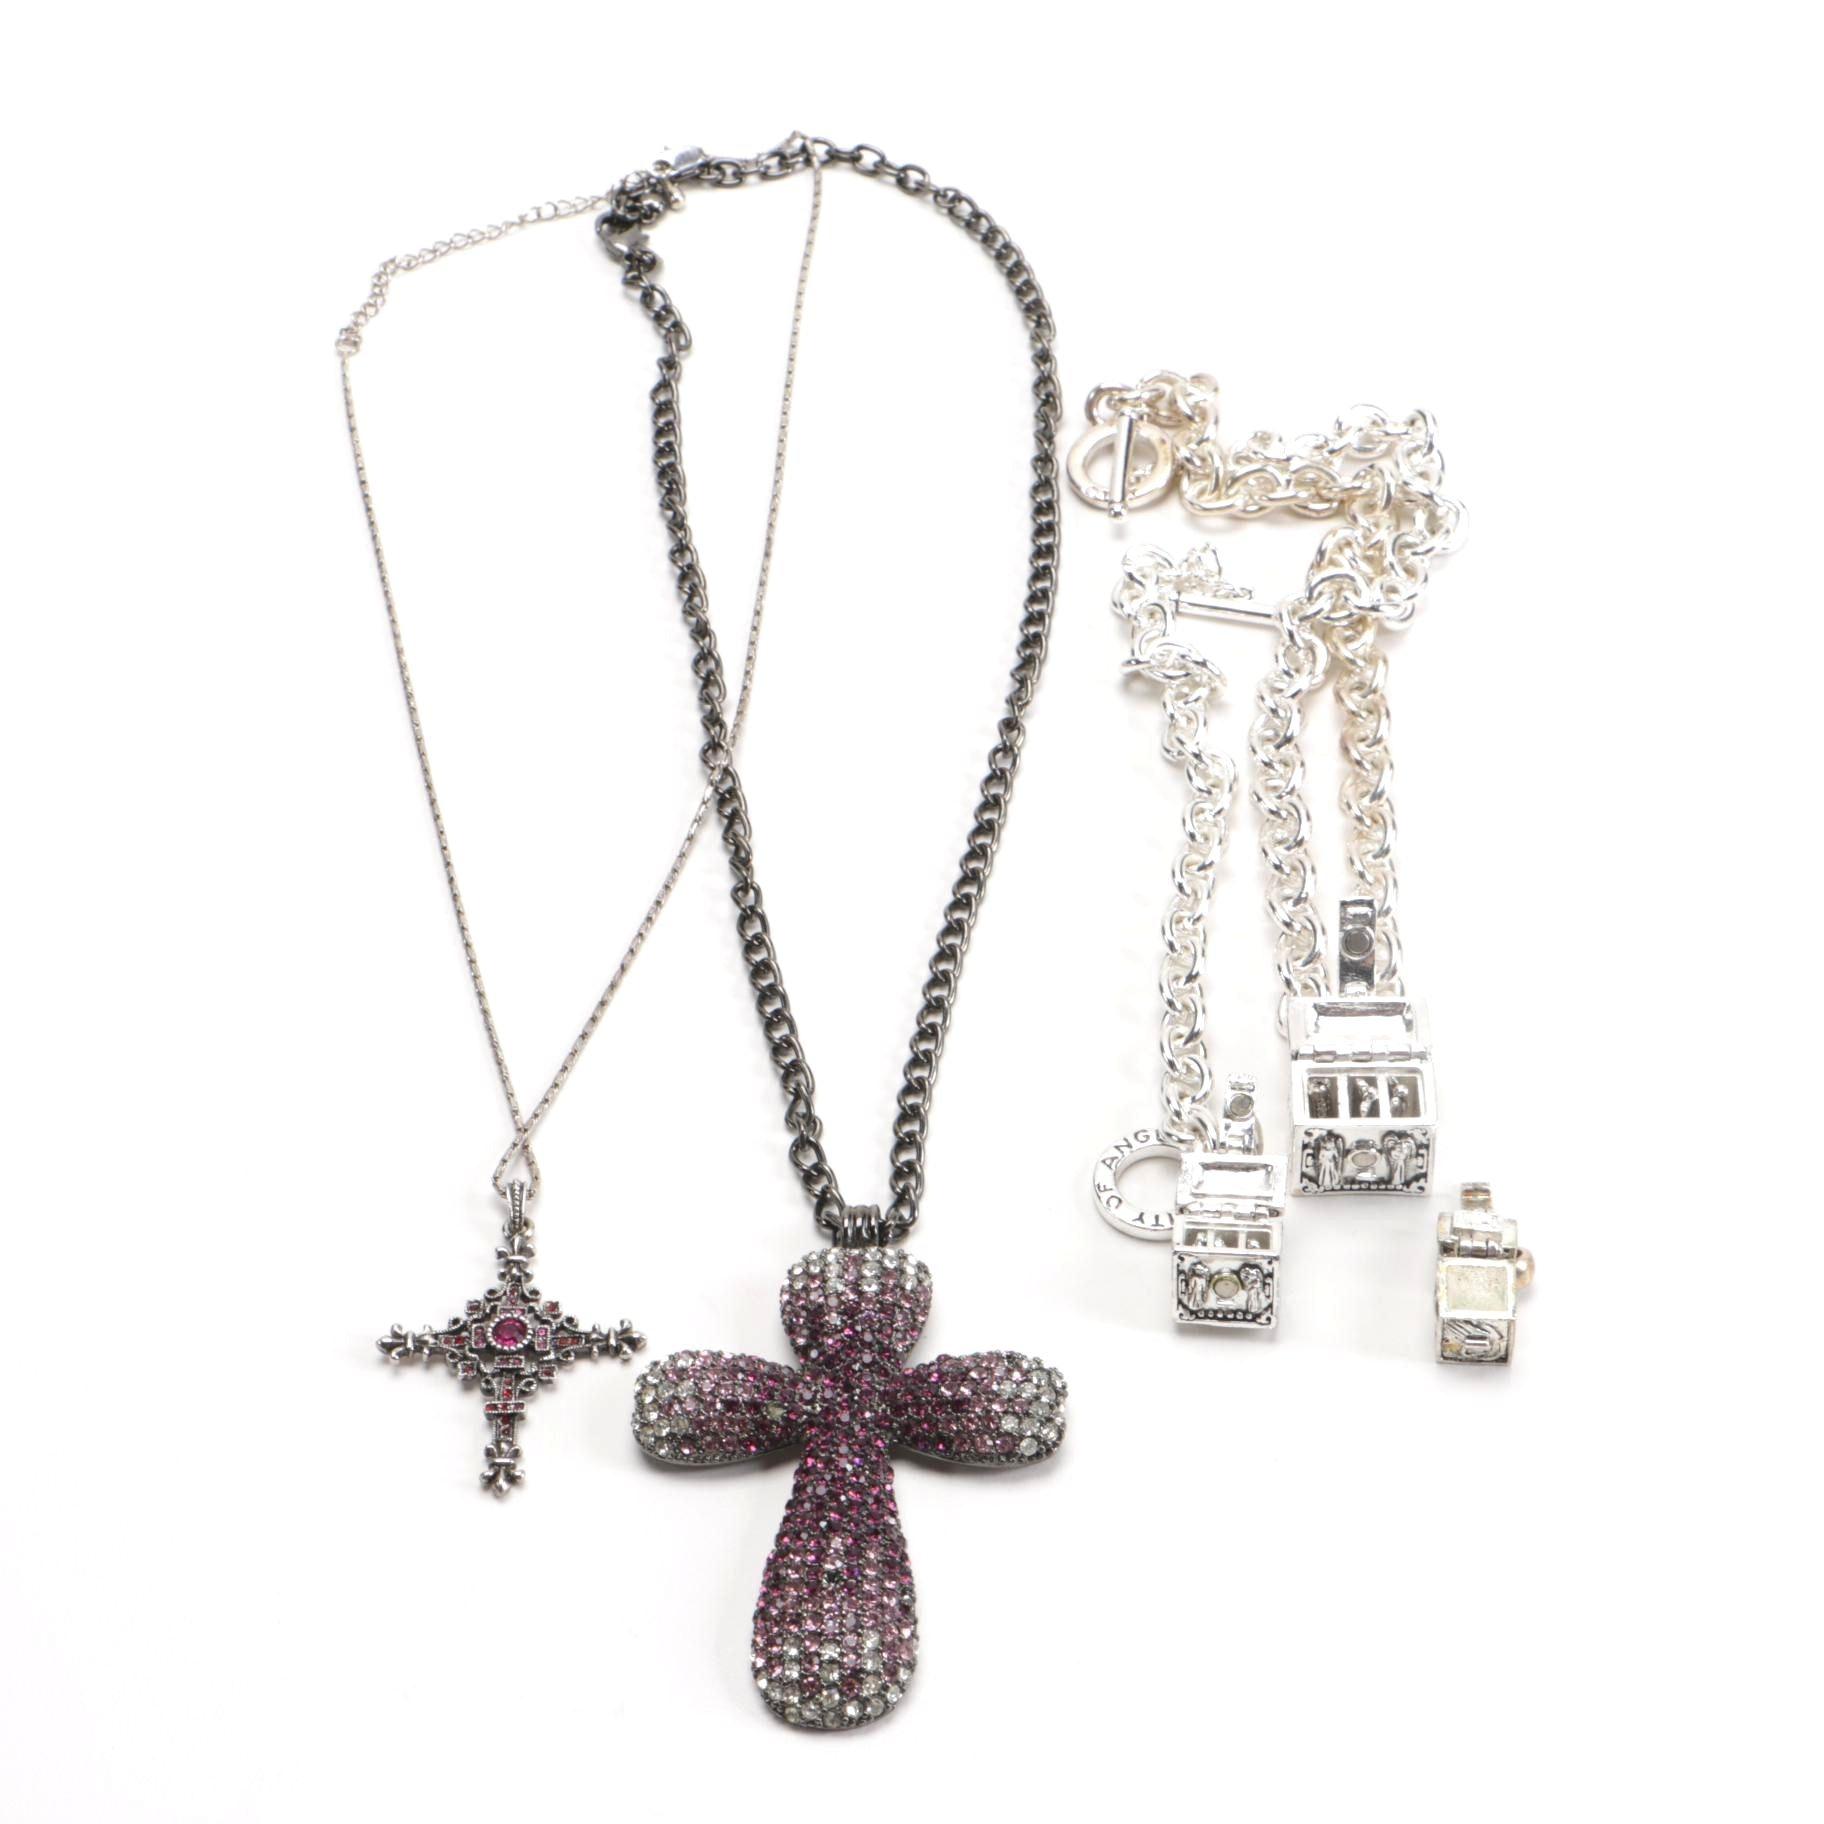 Religious-Inspired Costume Necklaces